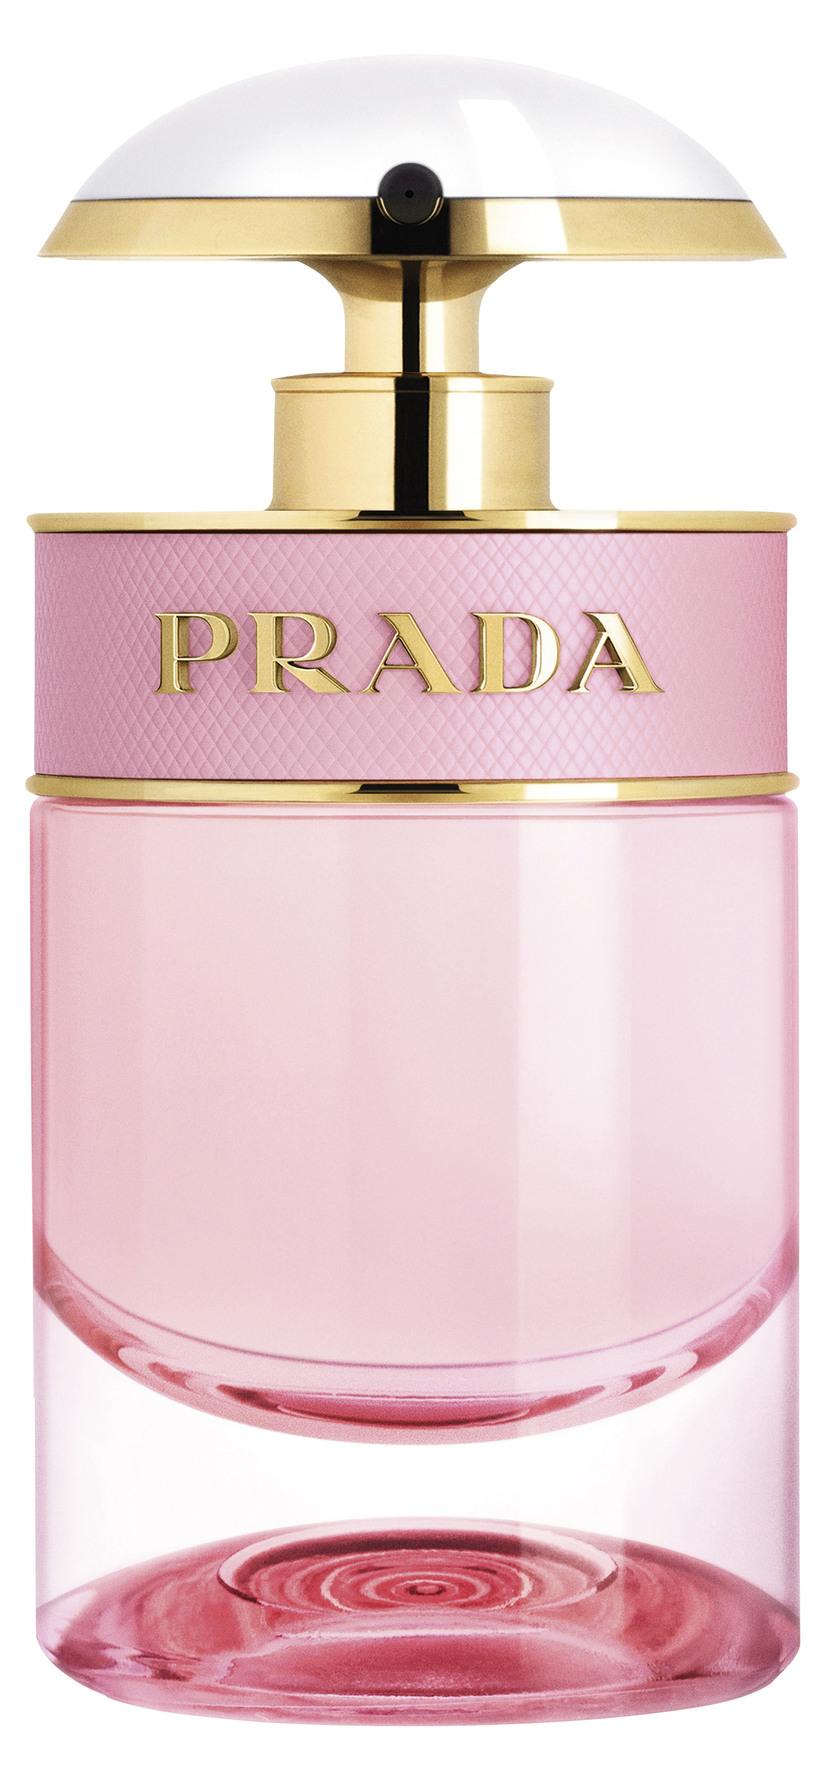 prada parfume matas